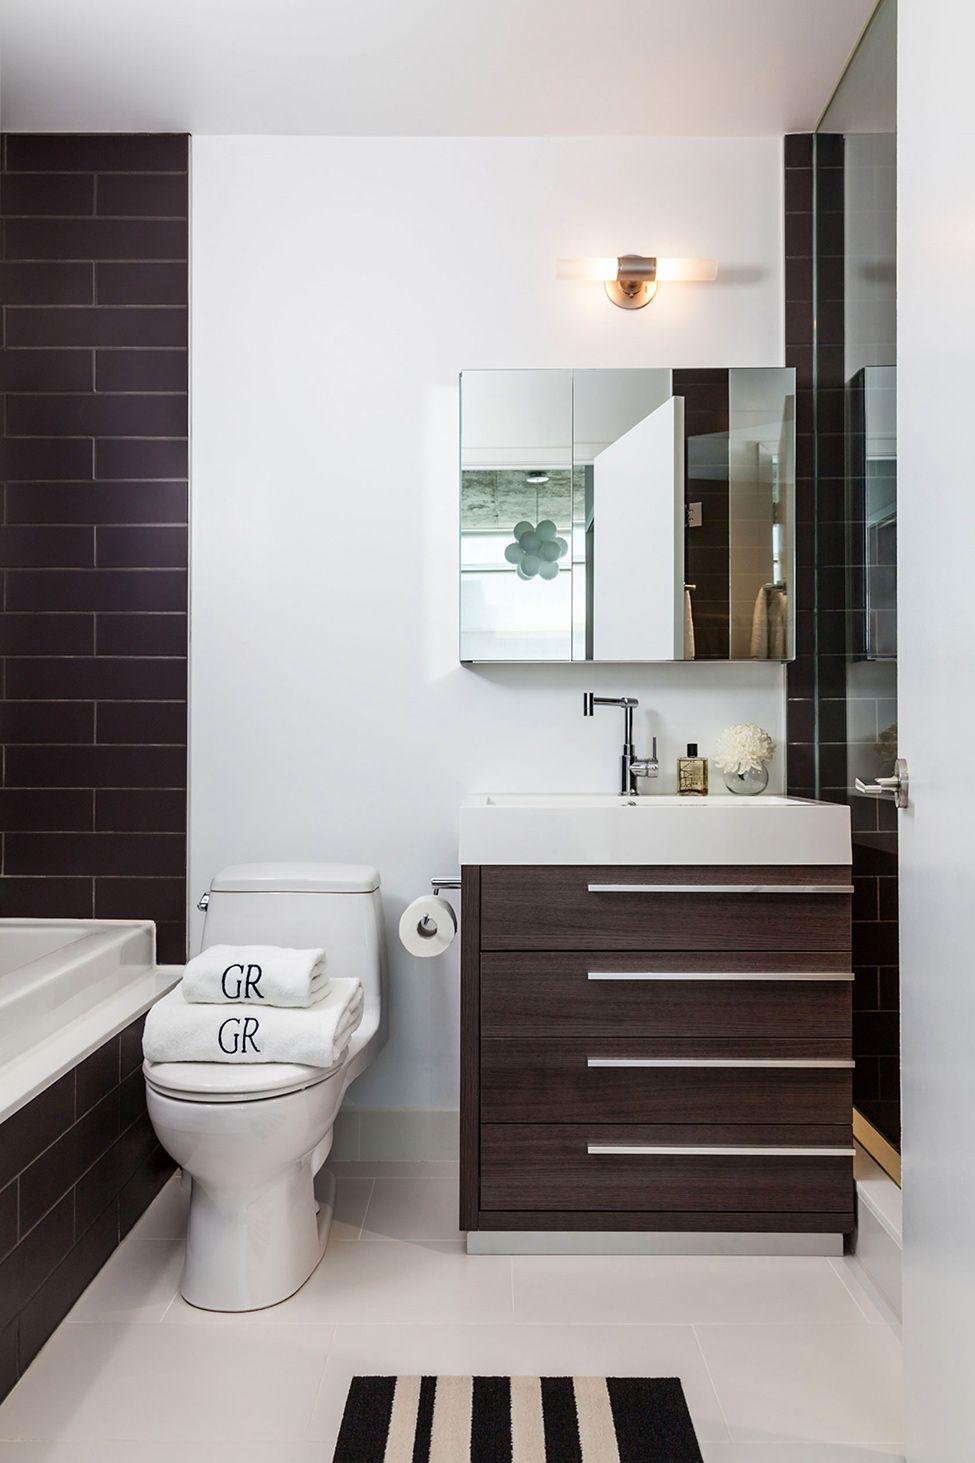 Pin by Felicia Robinson Scott on Bathroom Bliss | Pinterest | Modern ...